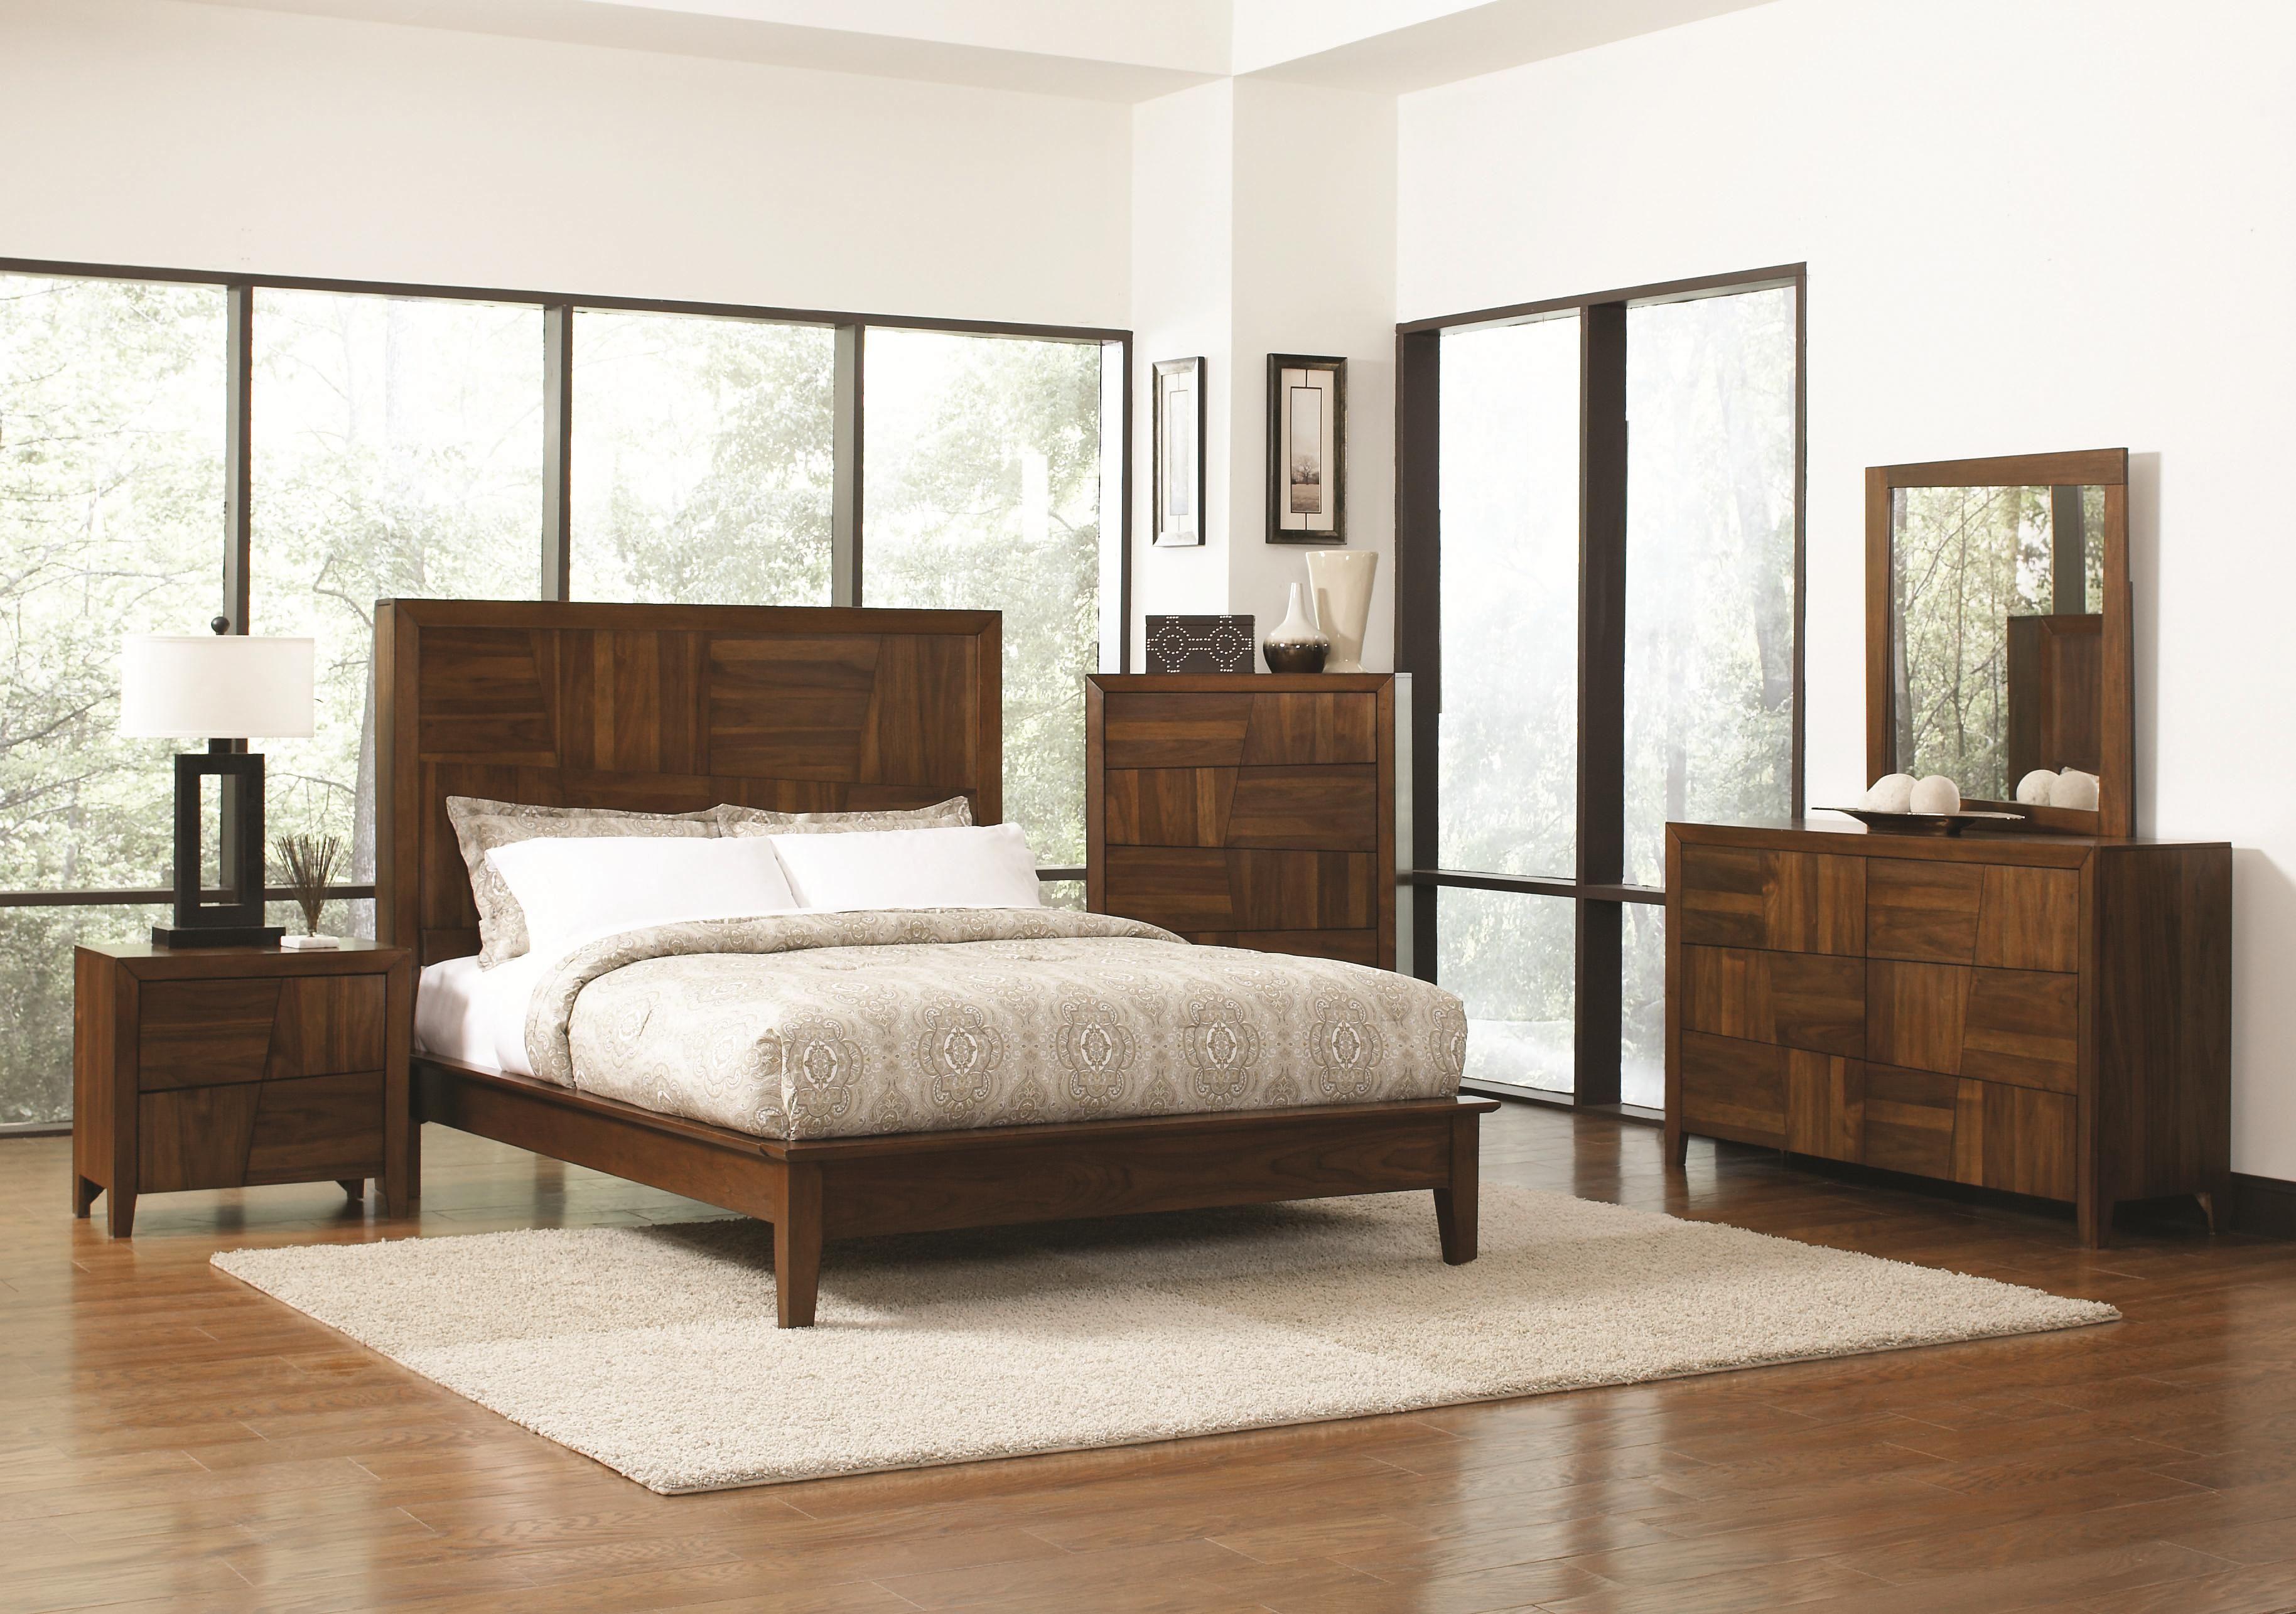 Master bed home pinterest tall headboard king platform bed